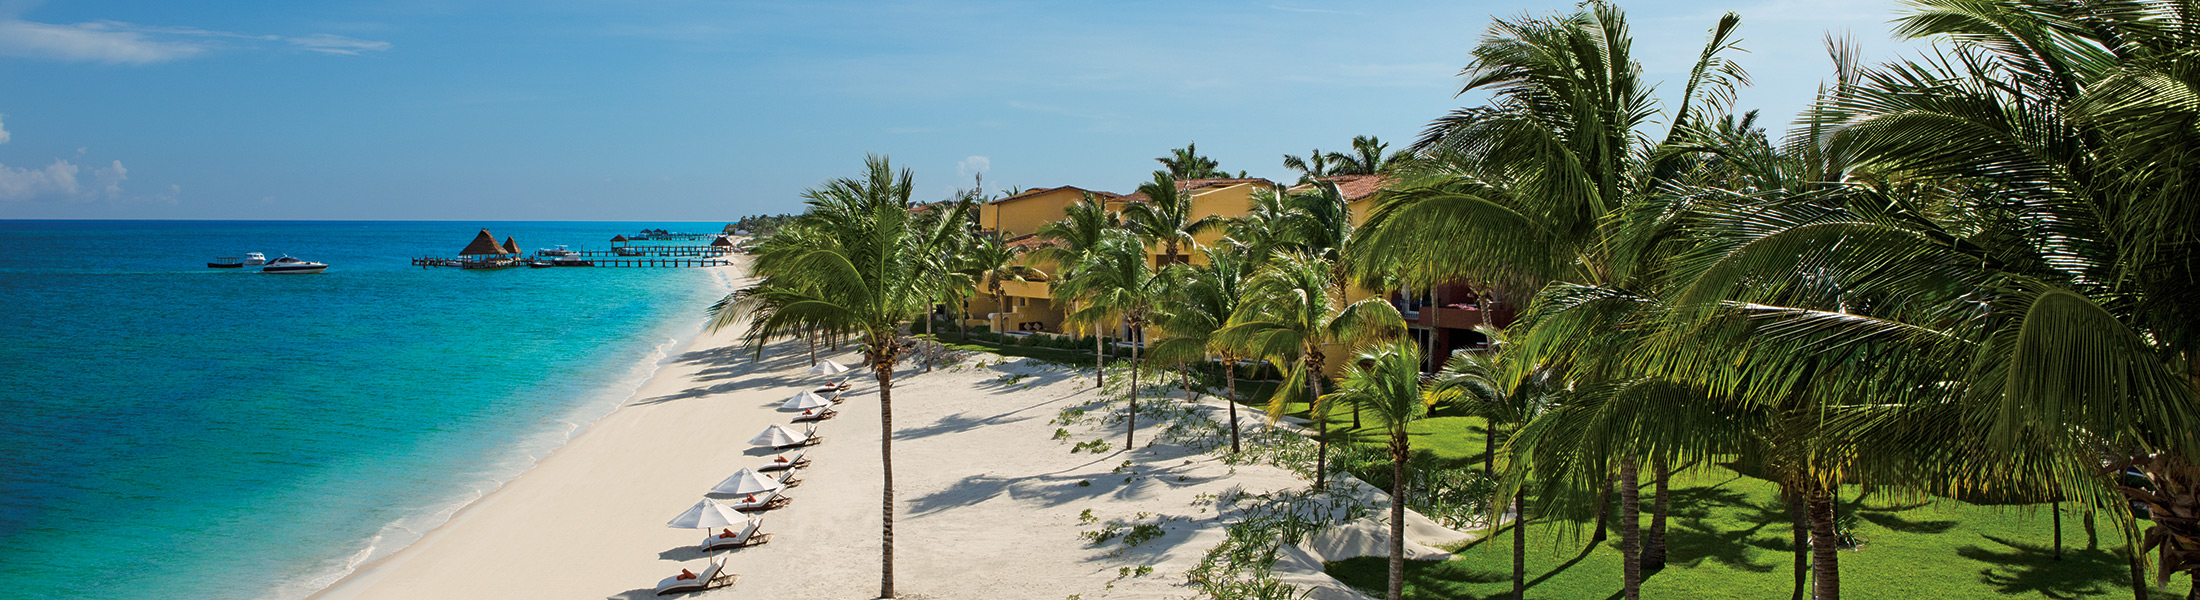 Beach with palmtrees at Zoetry Paraiso de la Bonita